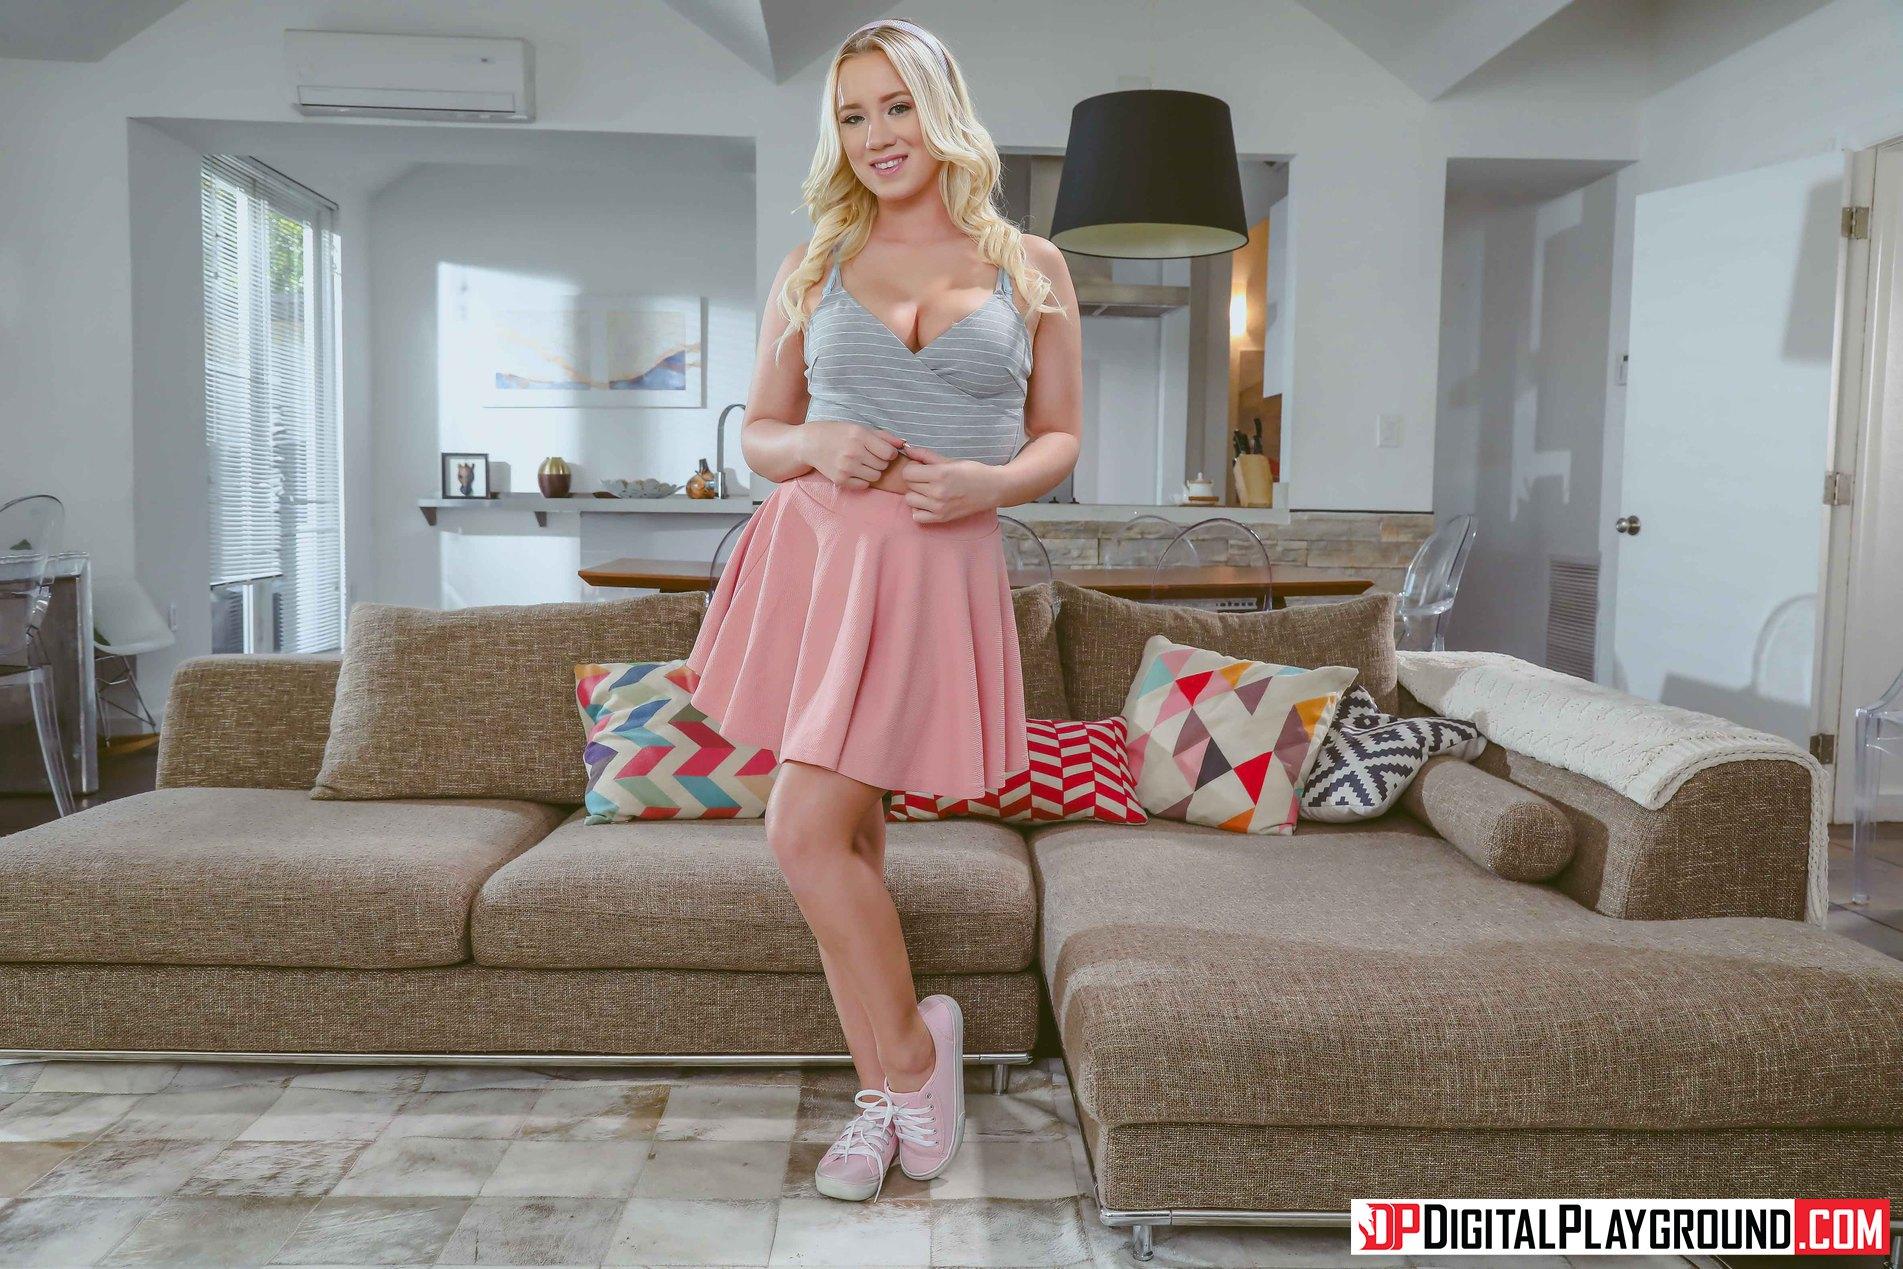 Bailey Brooke wallpaper : digital playground, mature women, blonde, living